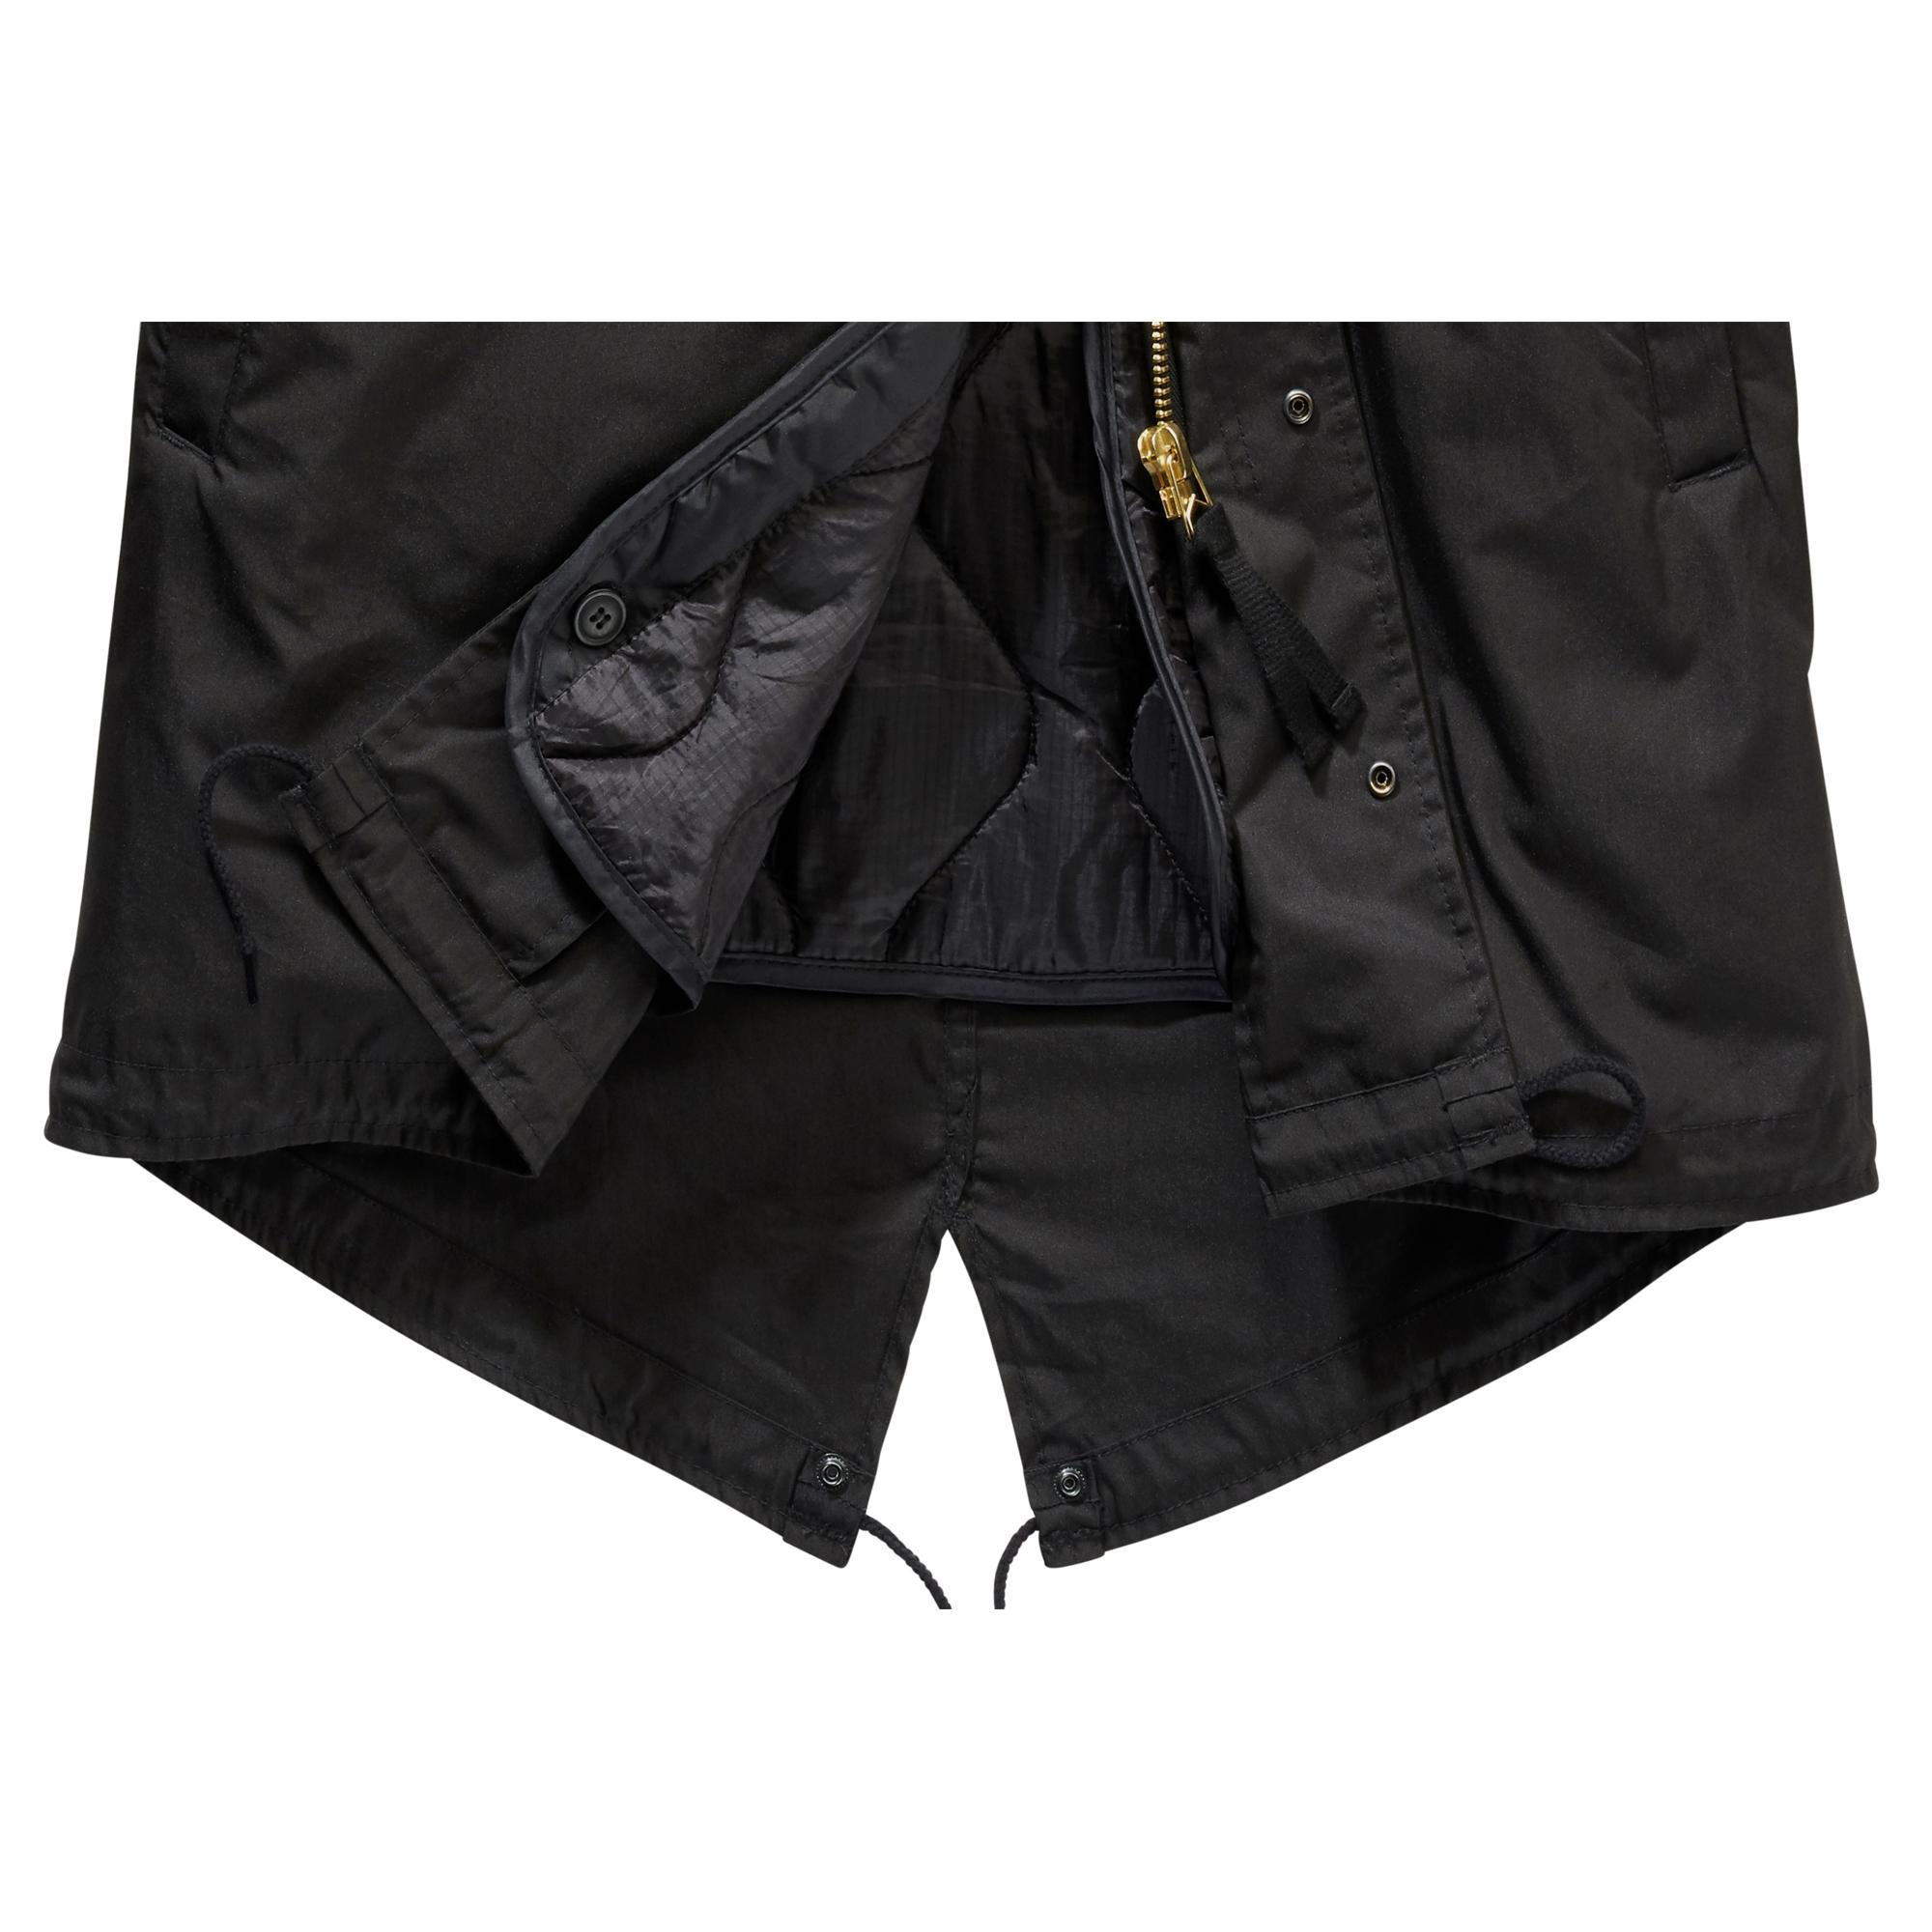 Indexbild 7 - Brandit US M51 Parka Winterjacke Fishtail Jacke Gefüttert Armee S-5XL